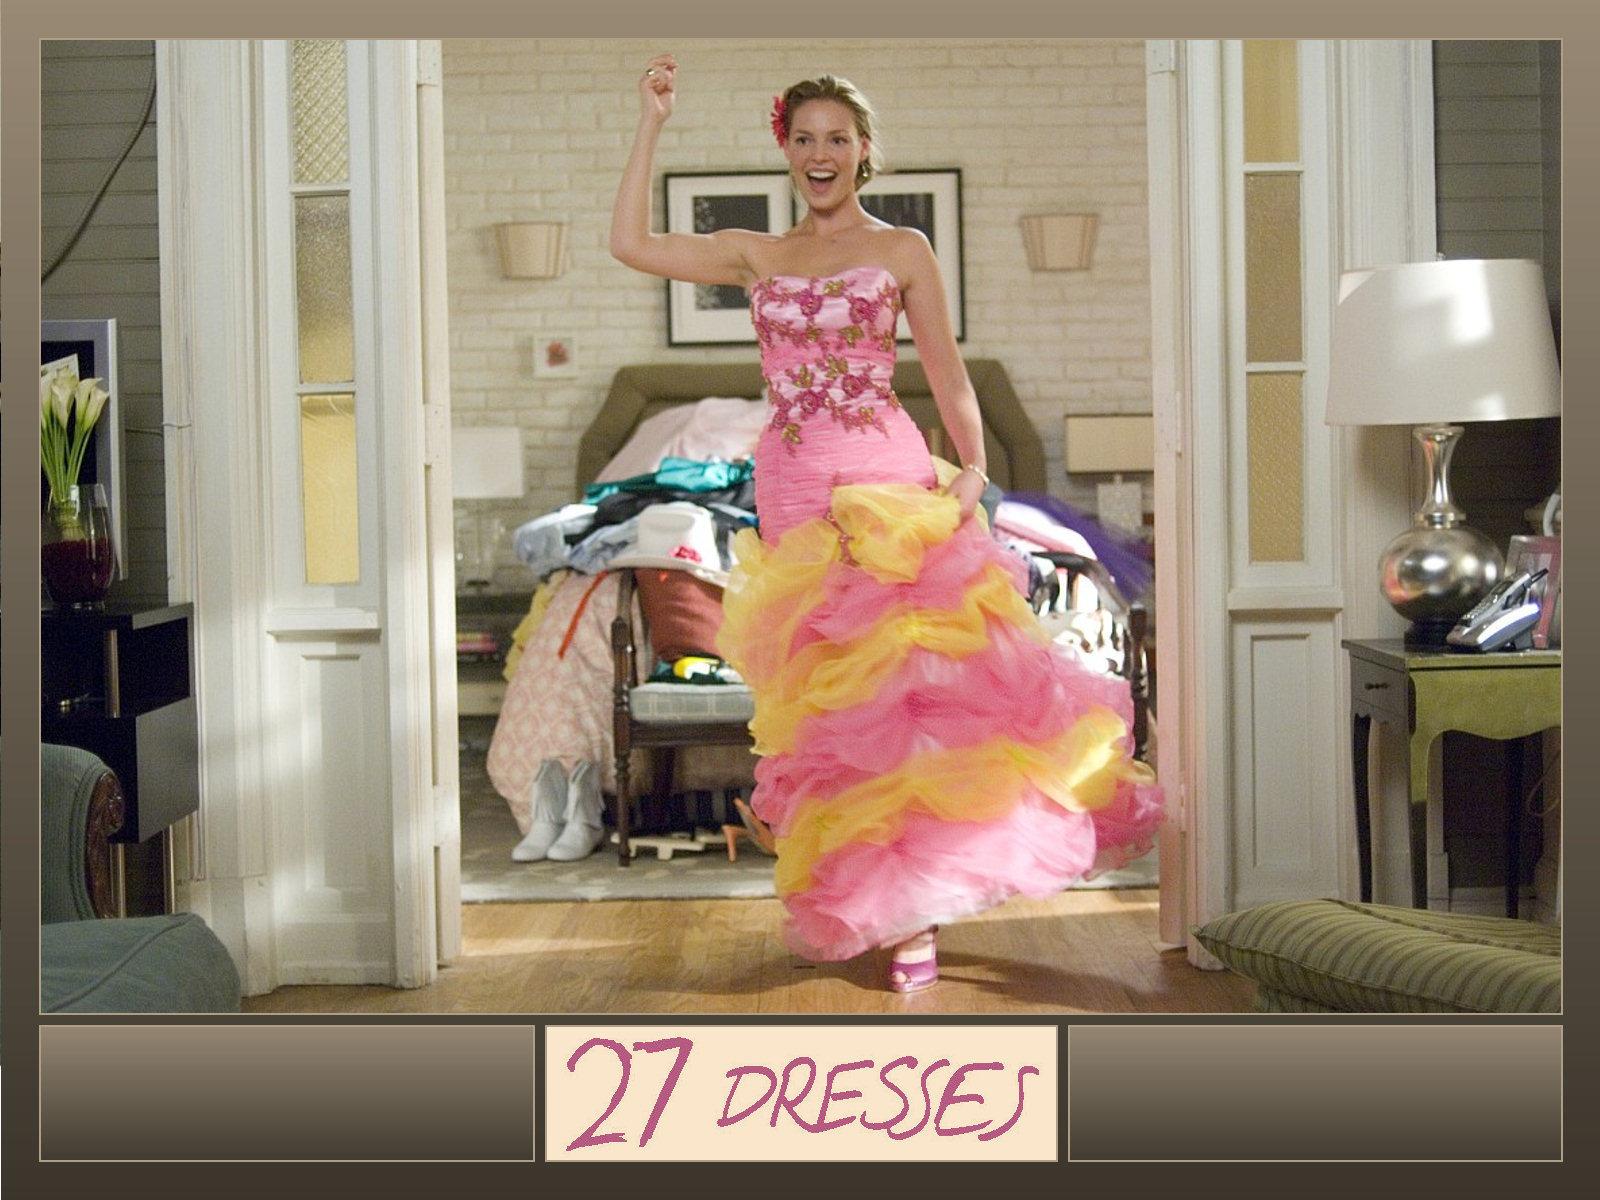 27 Dresses wallpaper